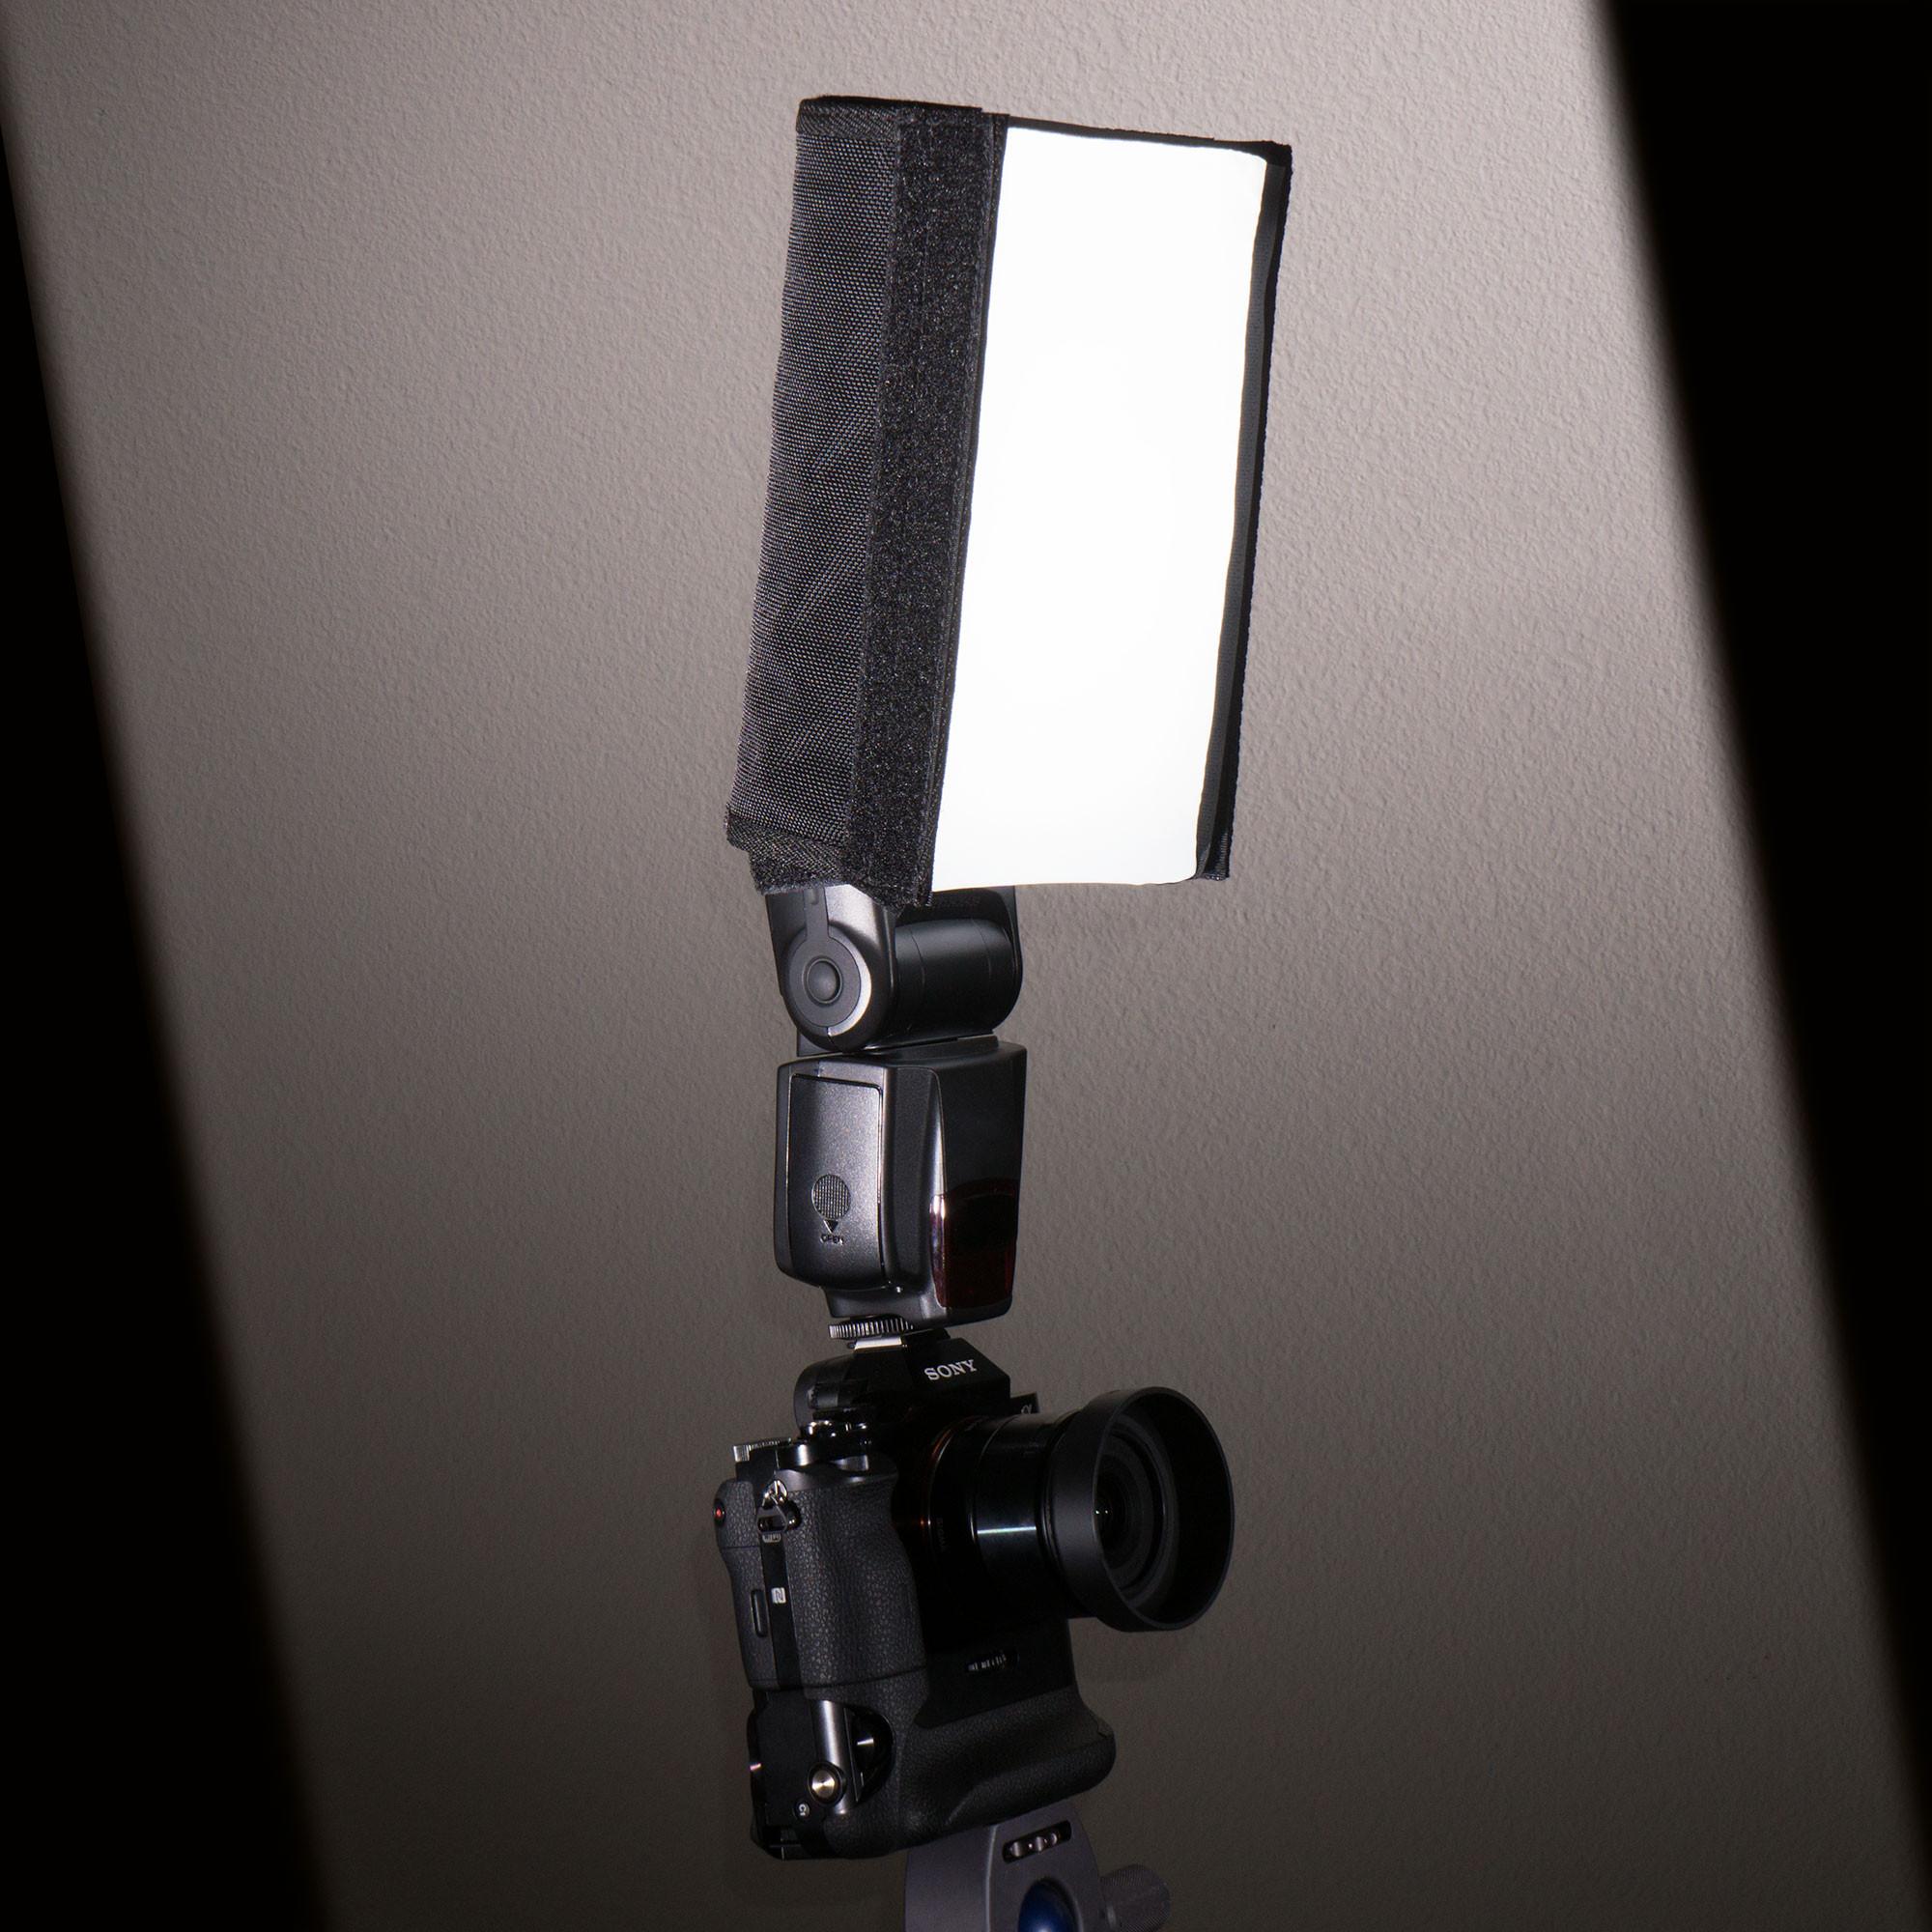 HONL Photo Speed Snoot MK2 - 3 in 1 - Snoot Spotvorsatz / Reflektor / Softbox